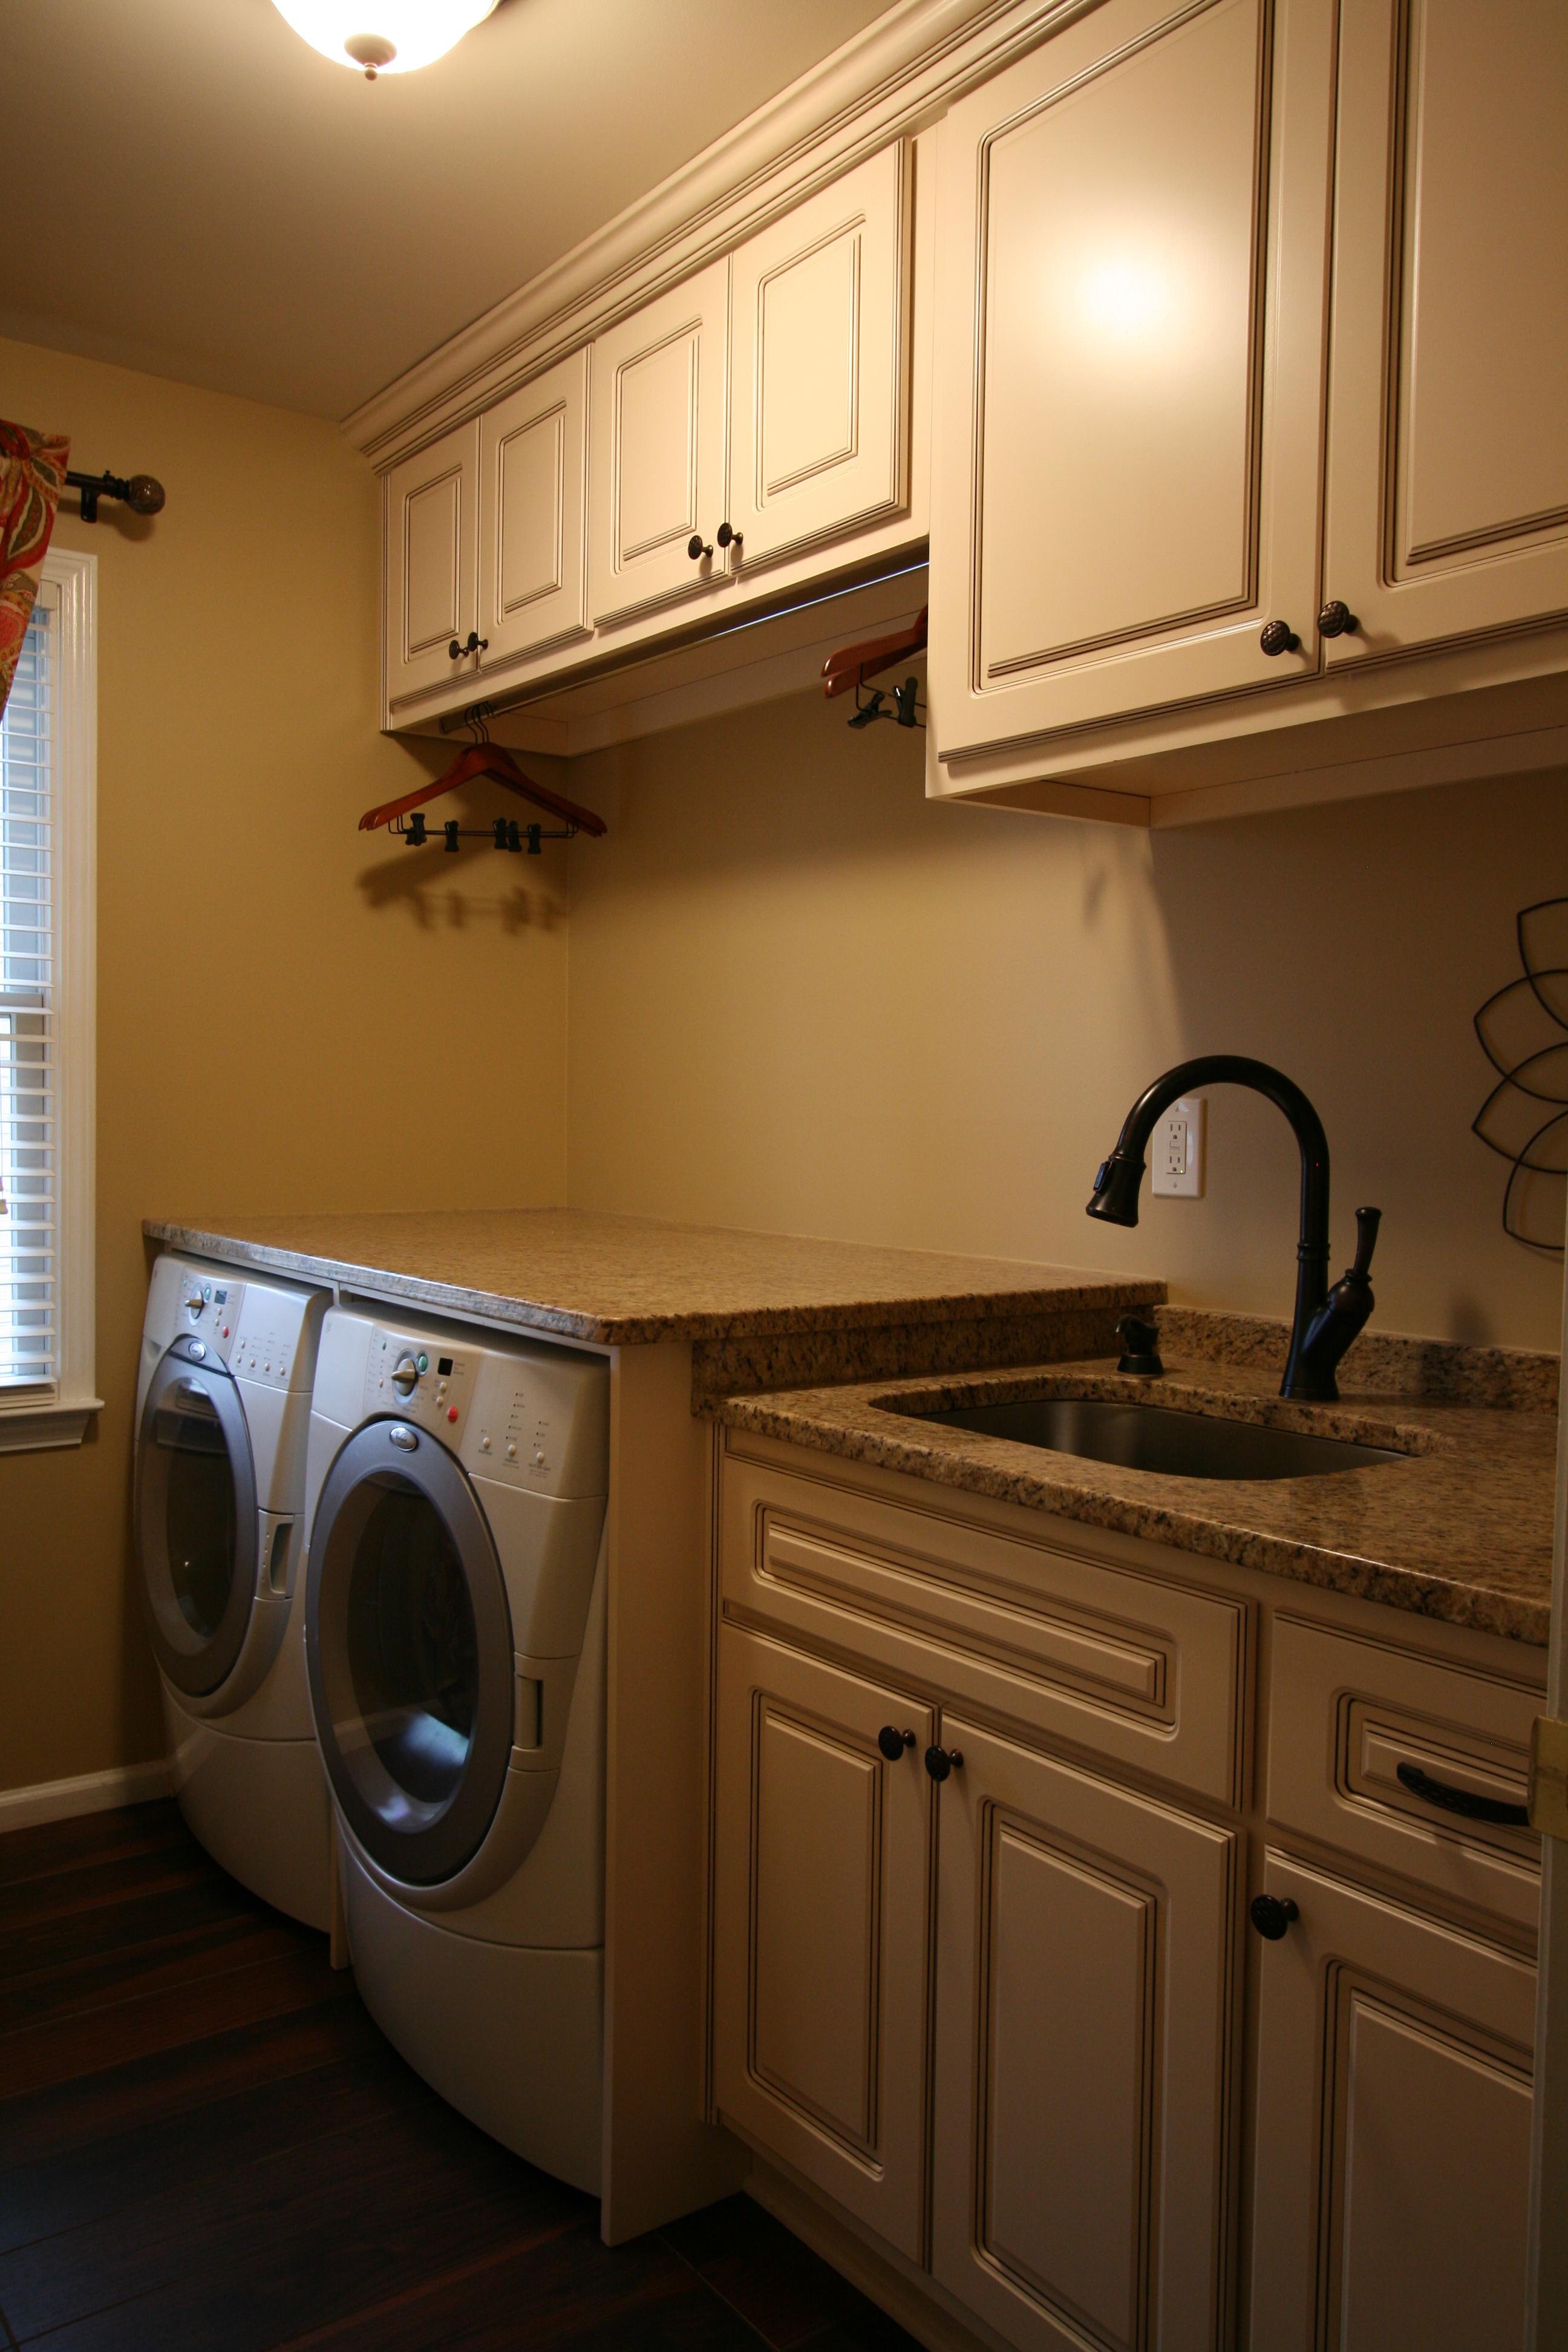 Laundry Room Remodel – Keystone Remodeling – Basements, Kitchen, Baths